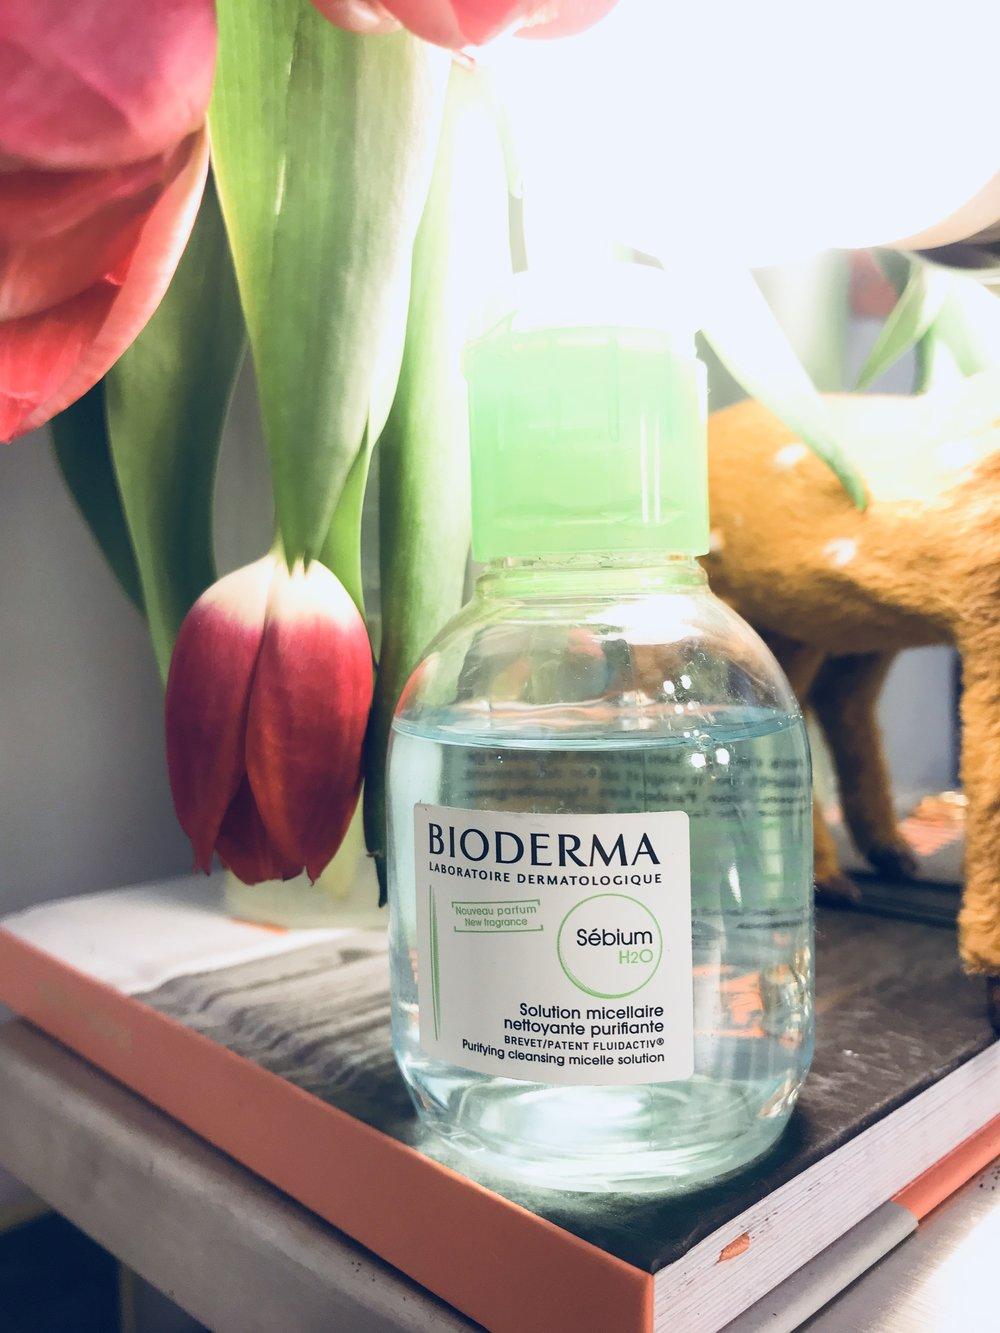 www.bioderma.com